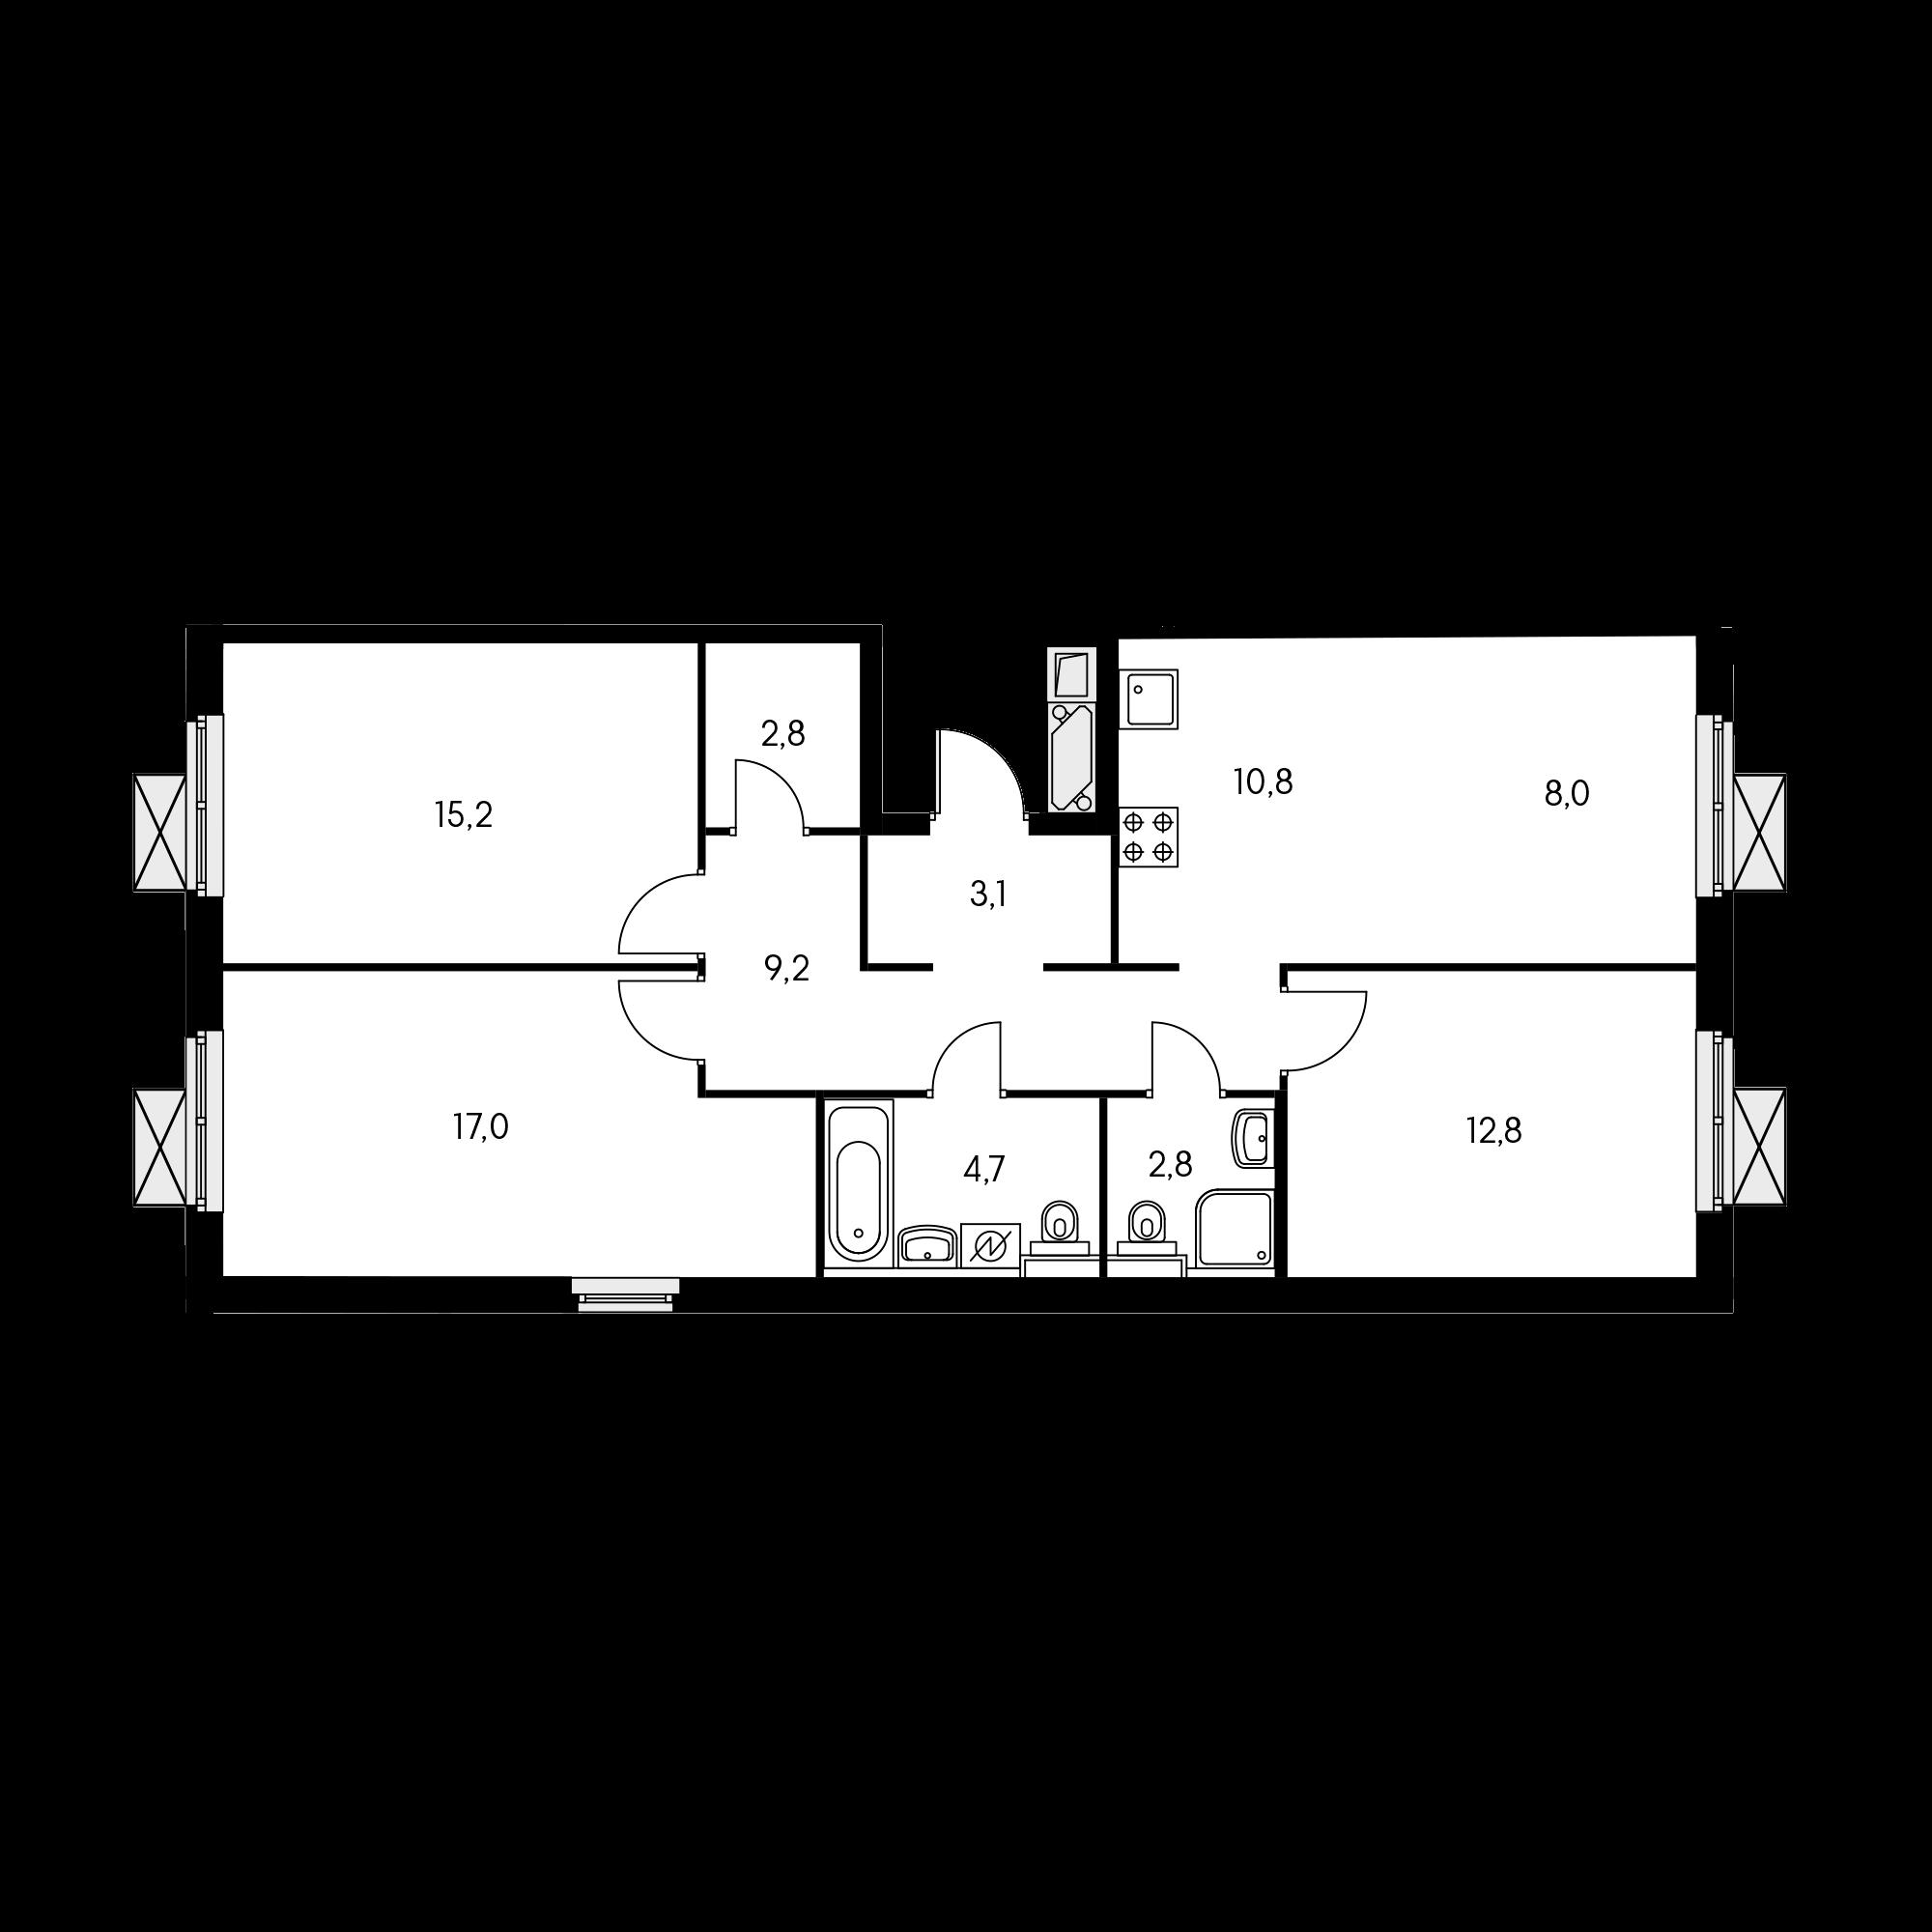 4KM3_6.6-1_T